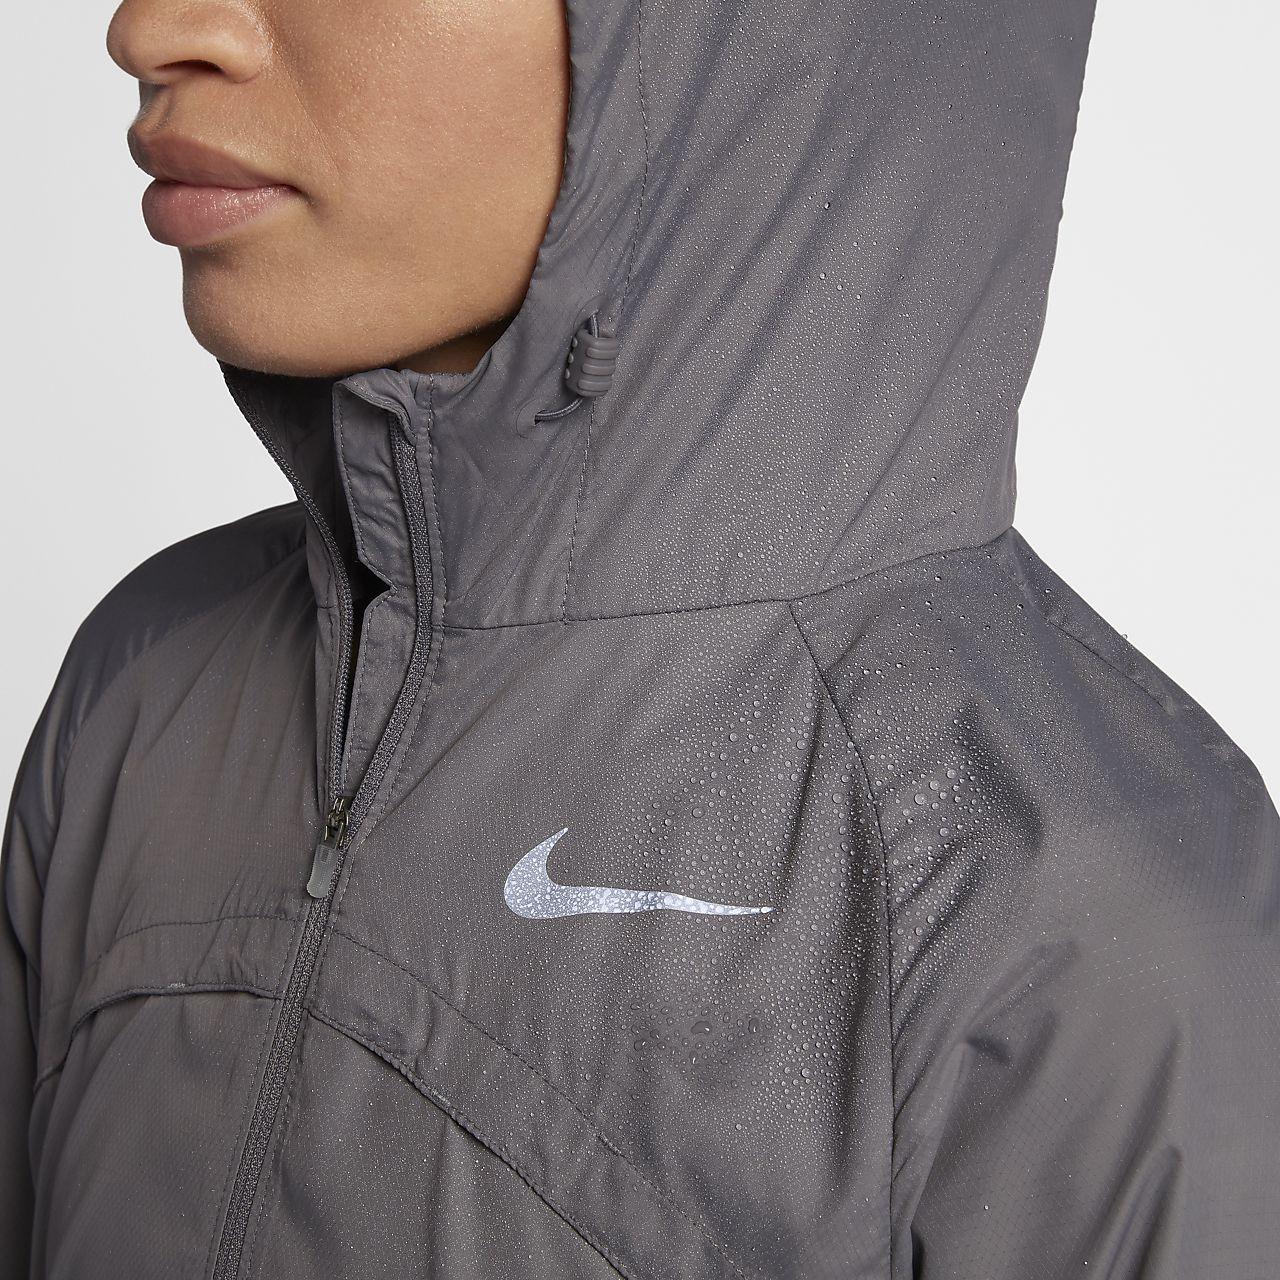 daee6ad93e2d Low Resolution Nike Shield Women s Running Jacket Nike Shield Women s  Running Jacket